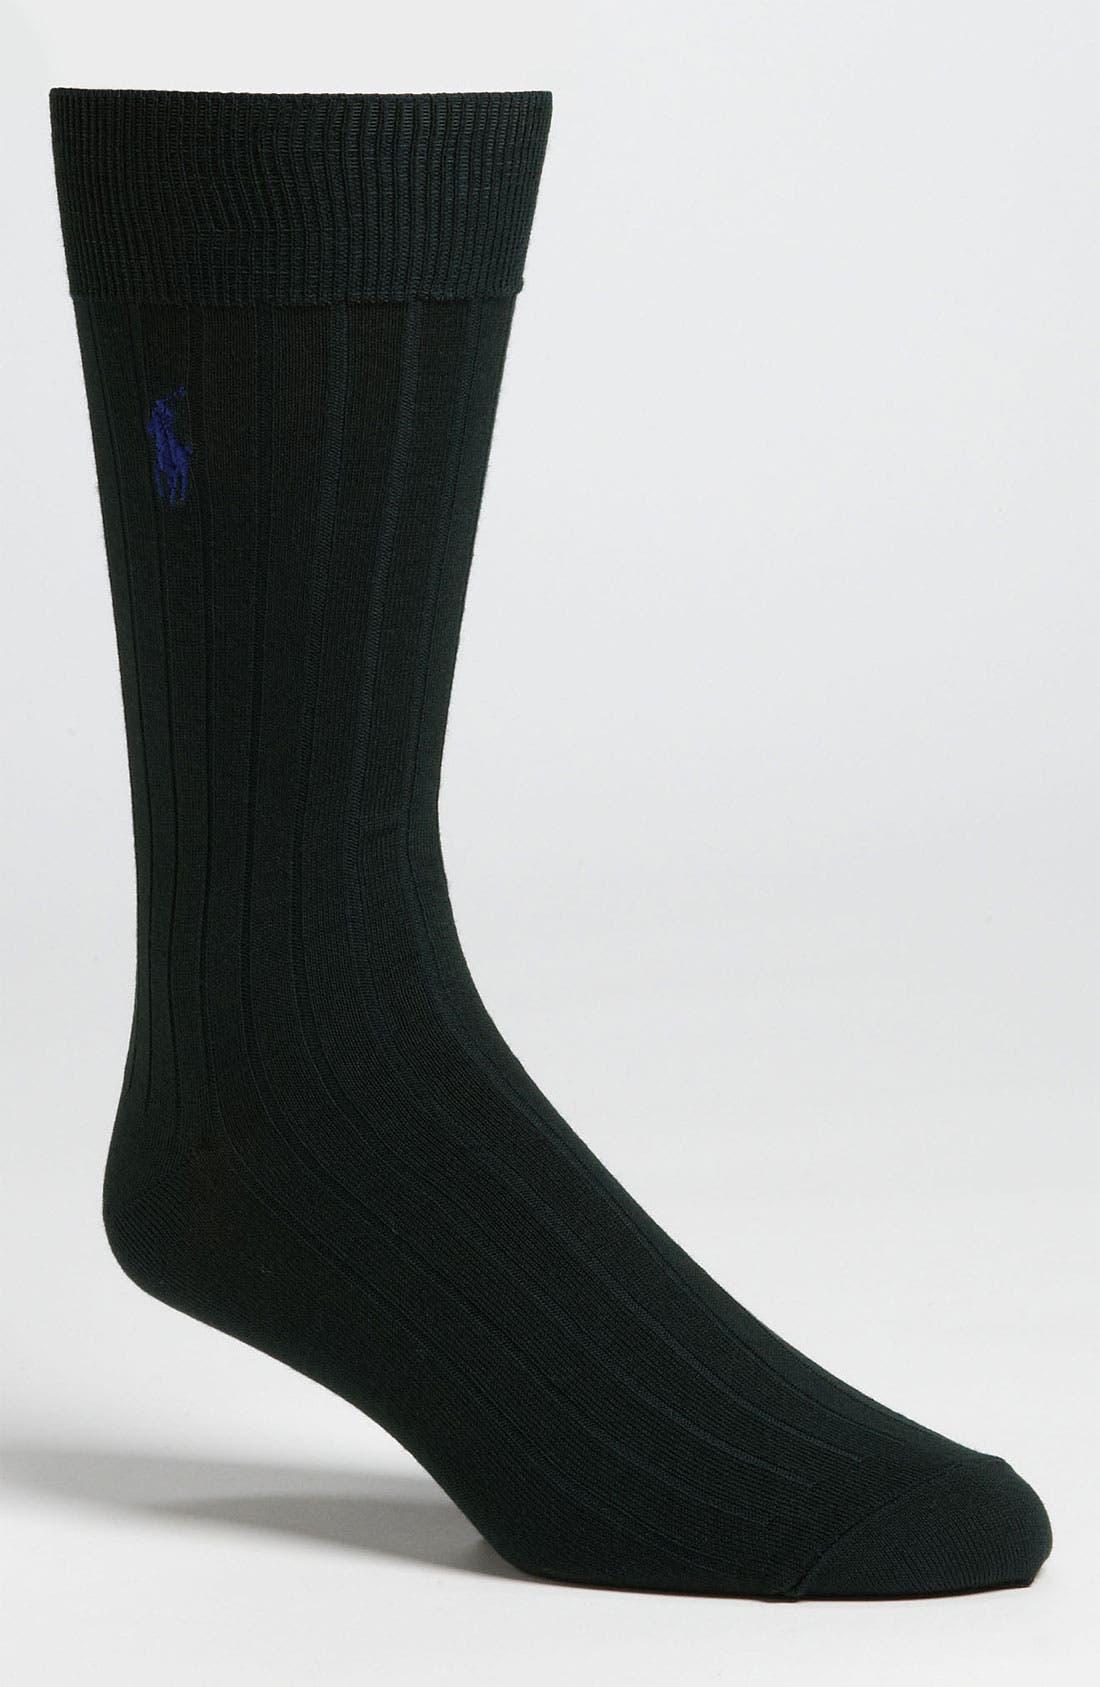 Main Image - Polo Ralph Lauren Rib Knit Cotton Socks